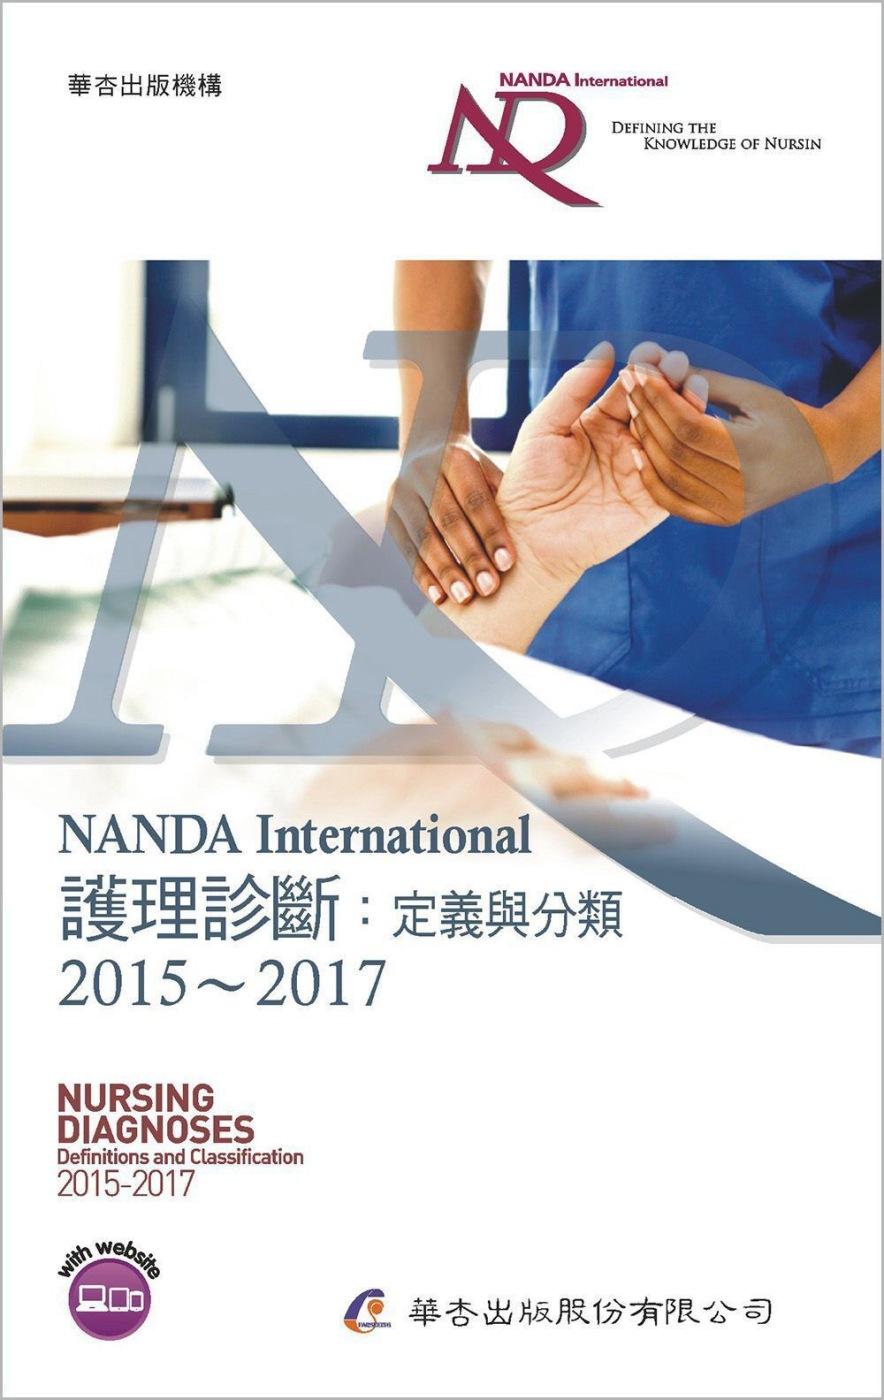 NANDA International 護理診斷:定義與分類 2015~2017 7版